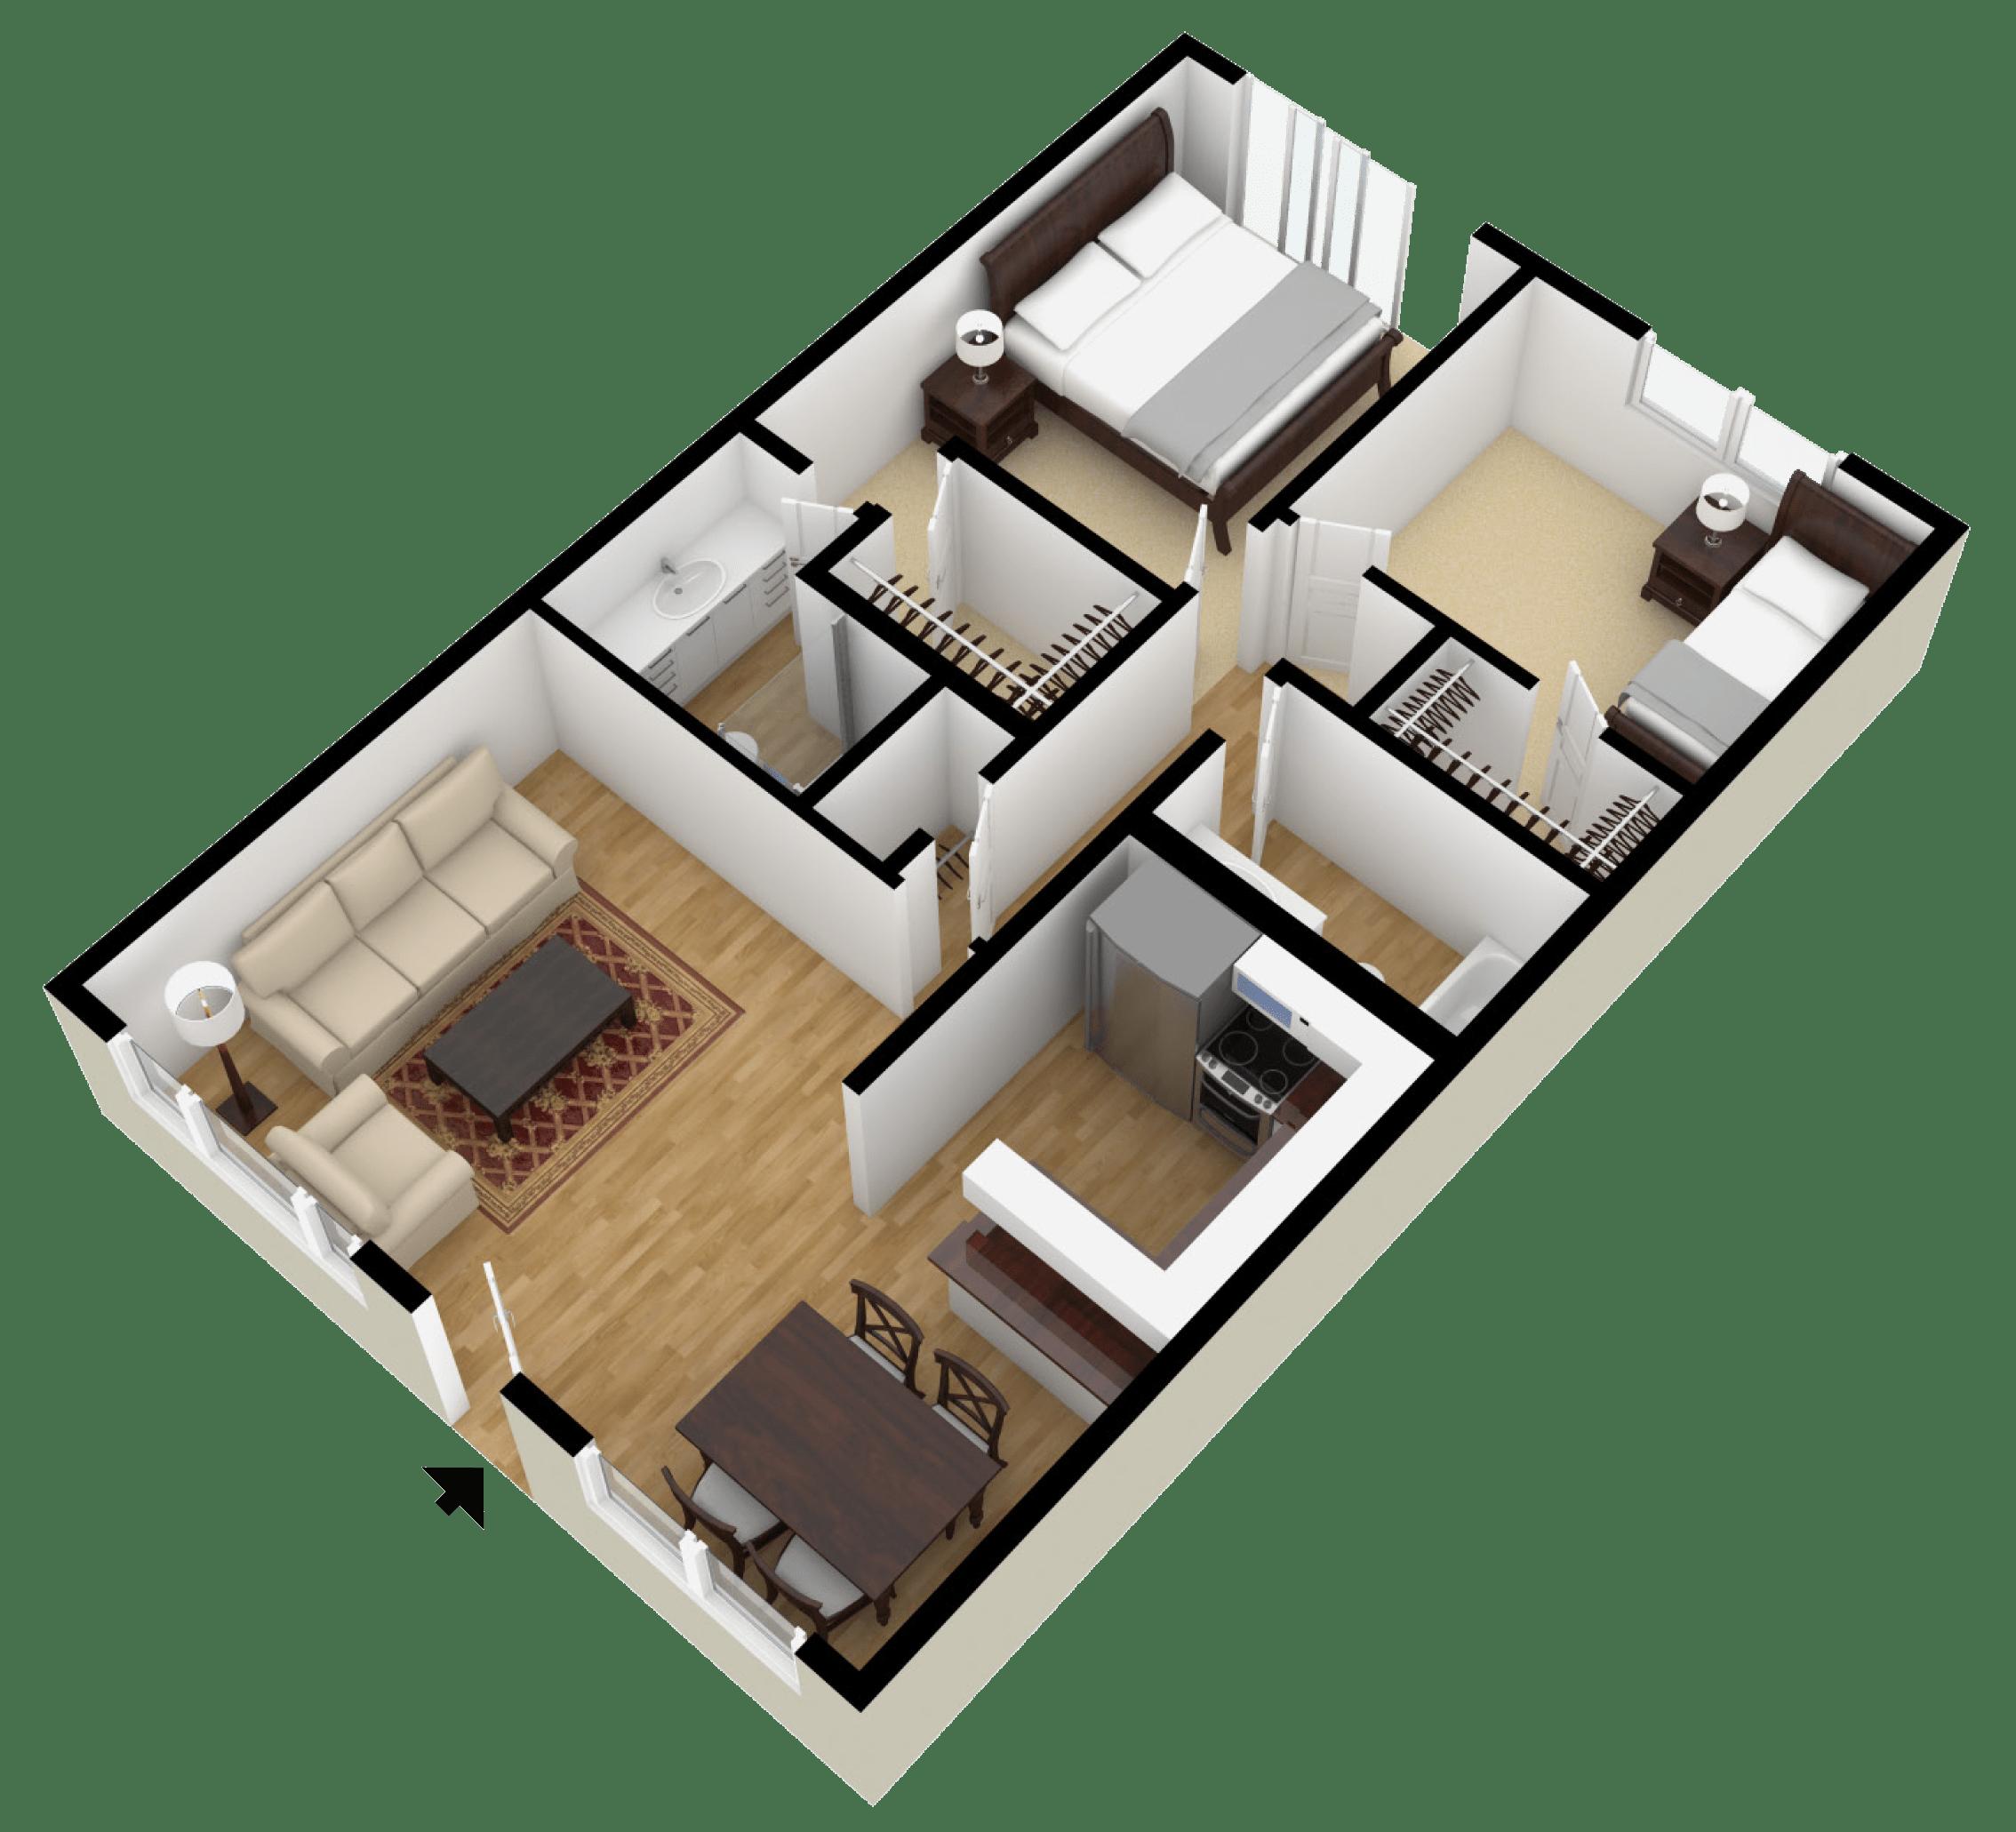 Studio 1 2 Bedroom Floor Plans City Plaza Apartments